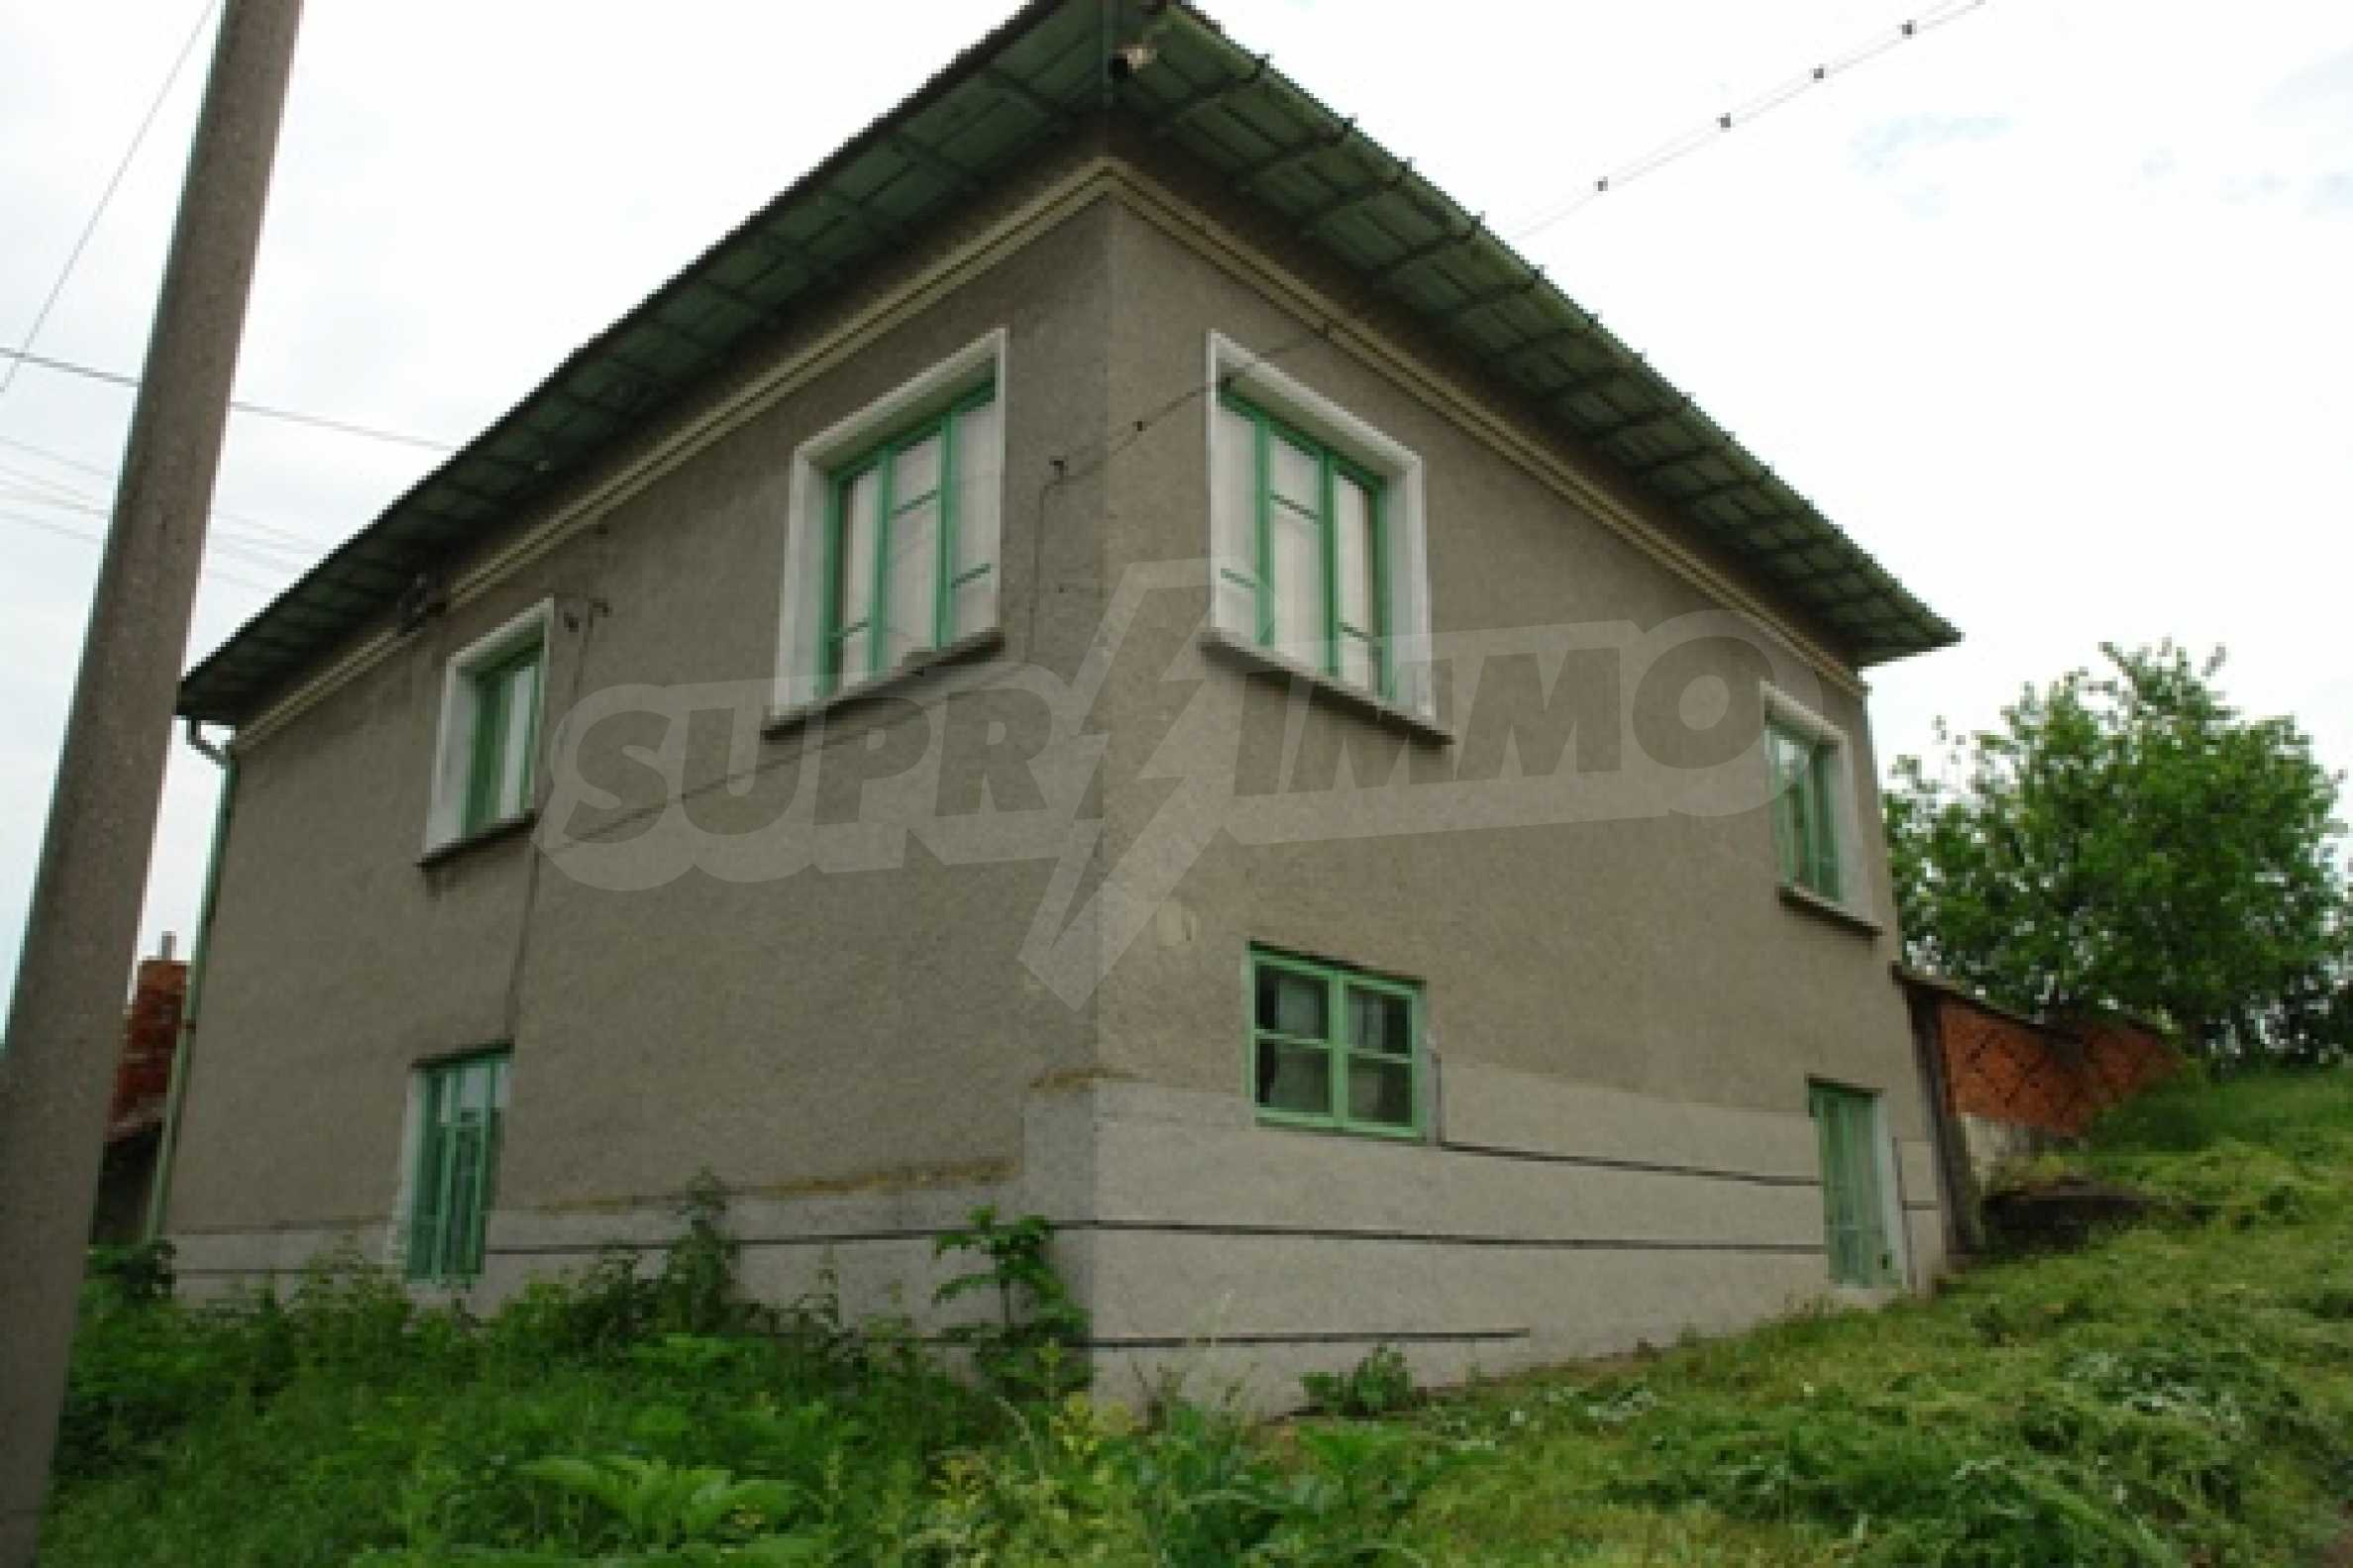 Spacious two-storey 4-bedroom house in Trastenik village, Ruse district 1